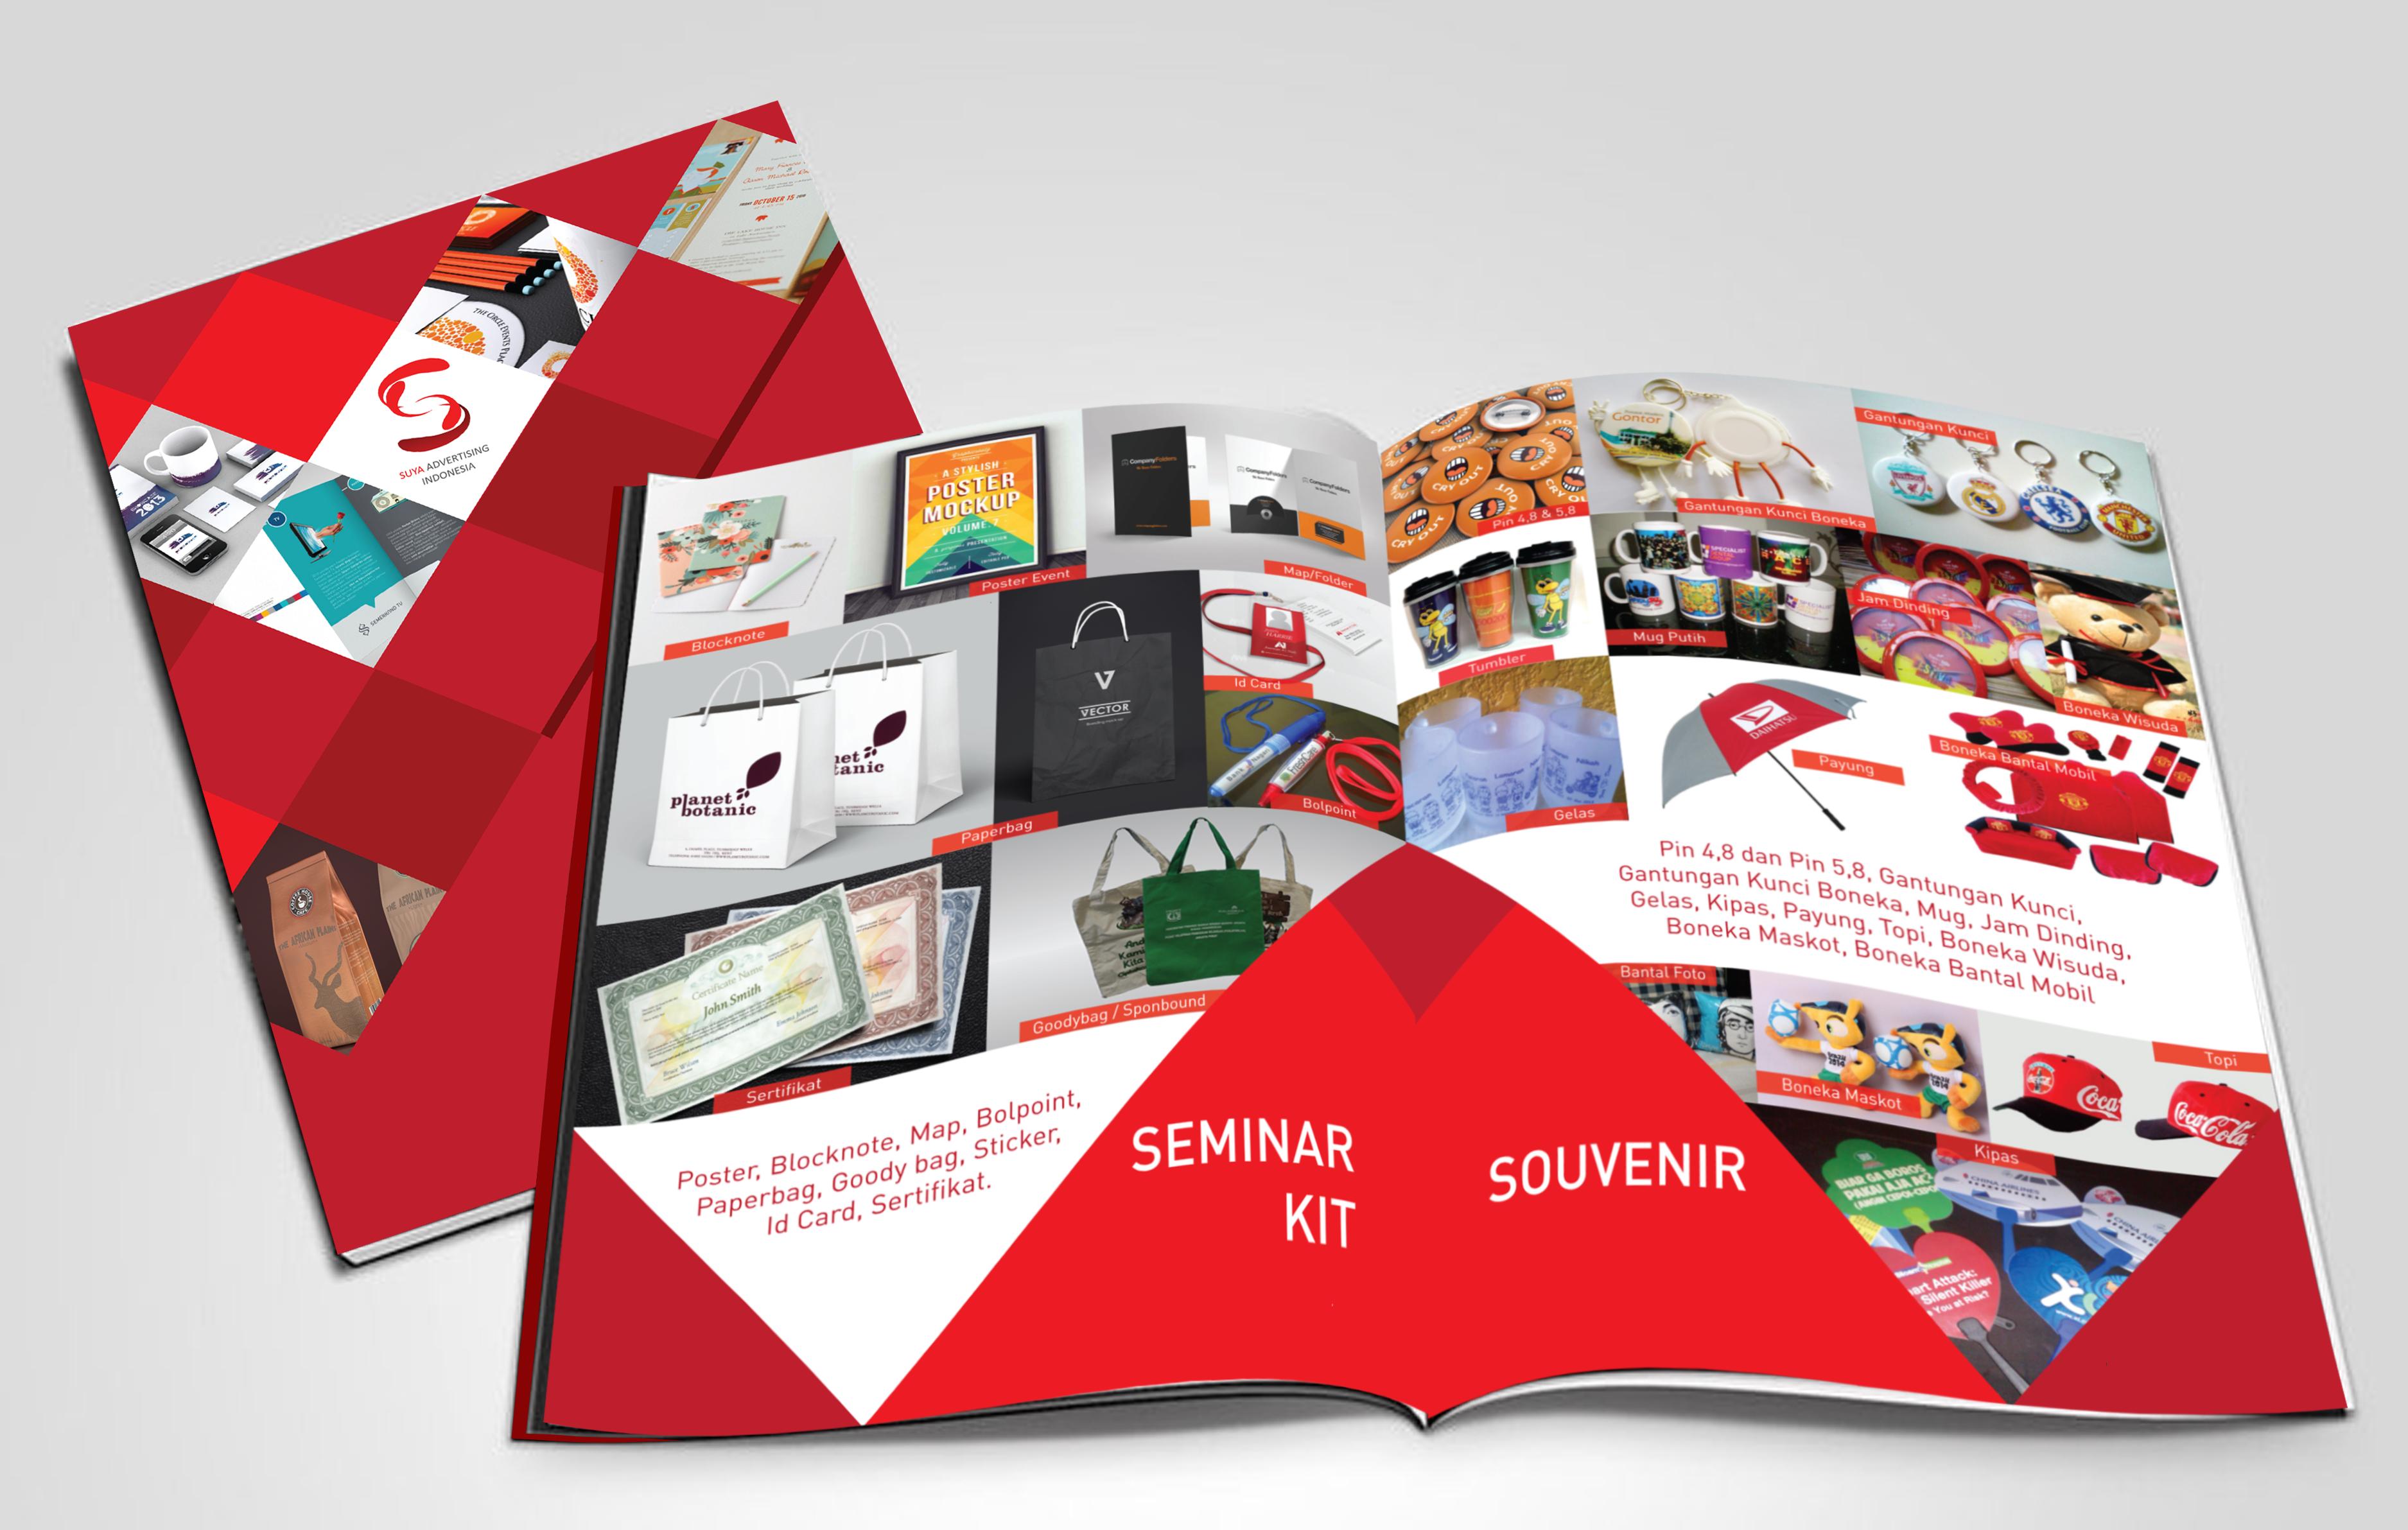 Design banner wisuda - Design Mockup Catalogue Product Suya Advertising Indonesia 1 All Visual Promotion Pinterest Mockup